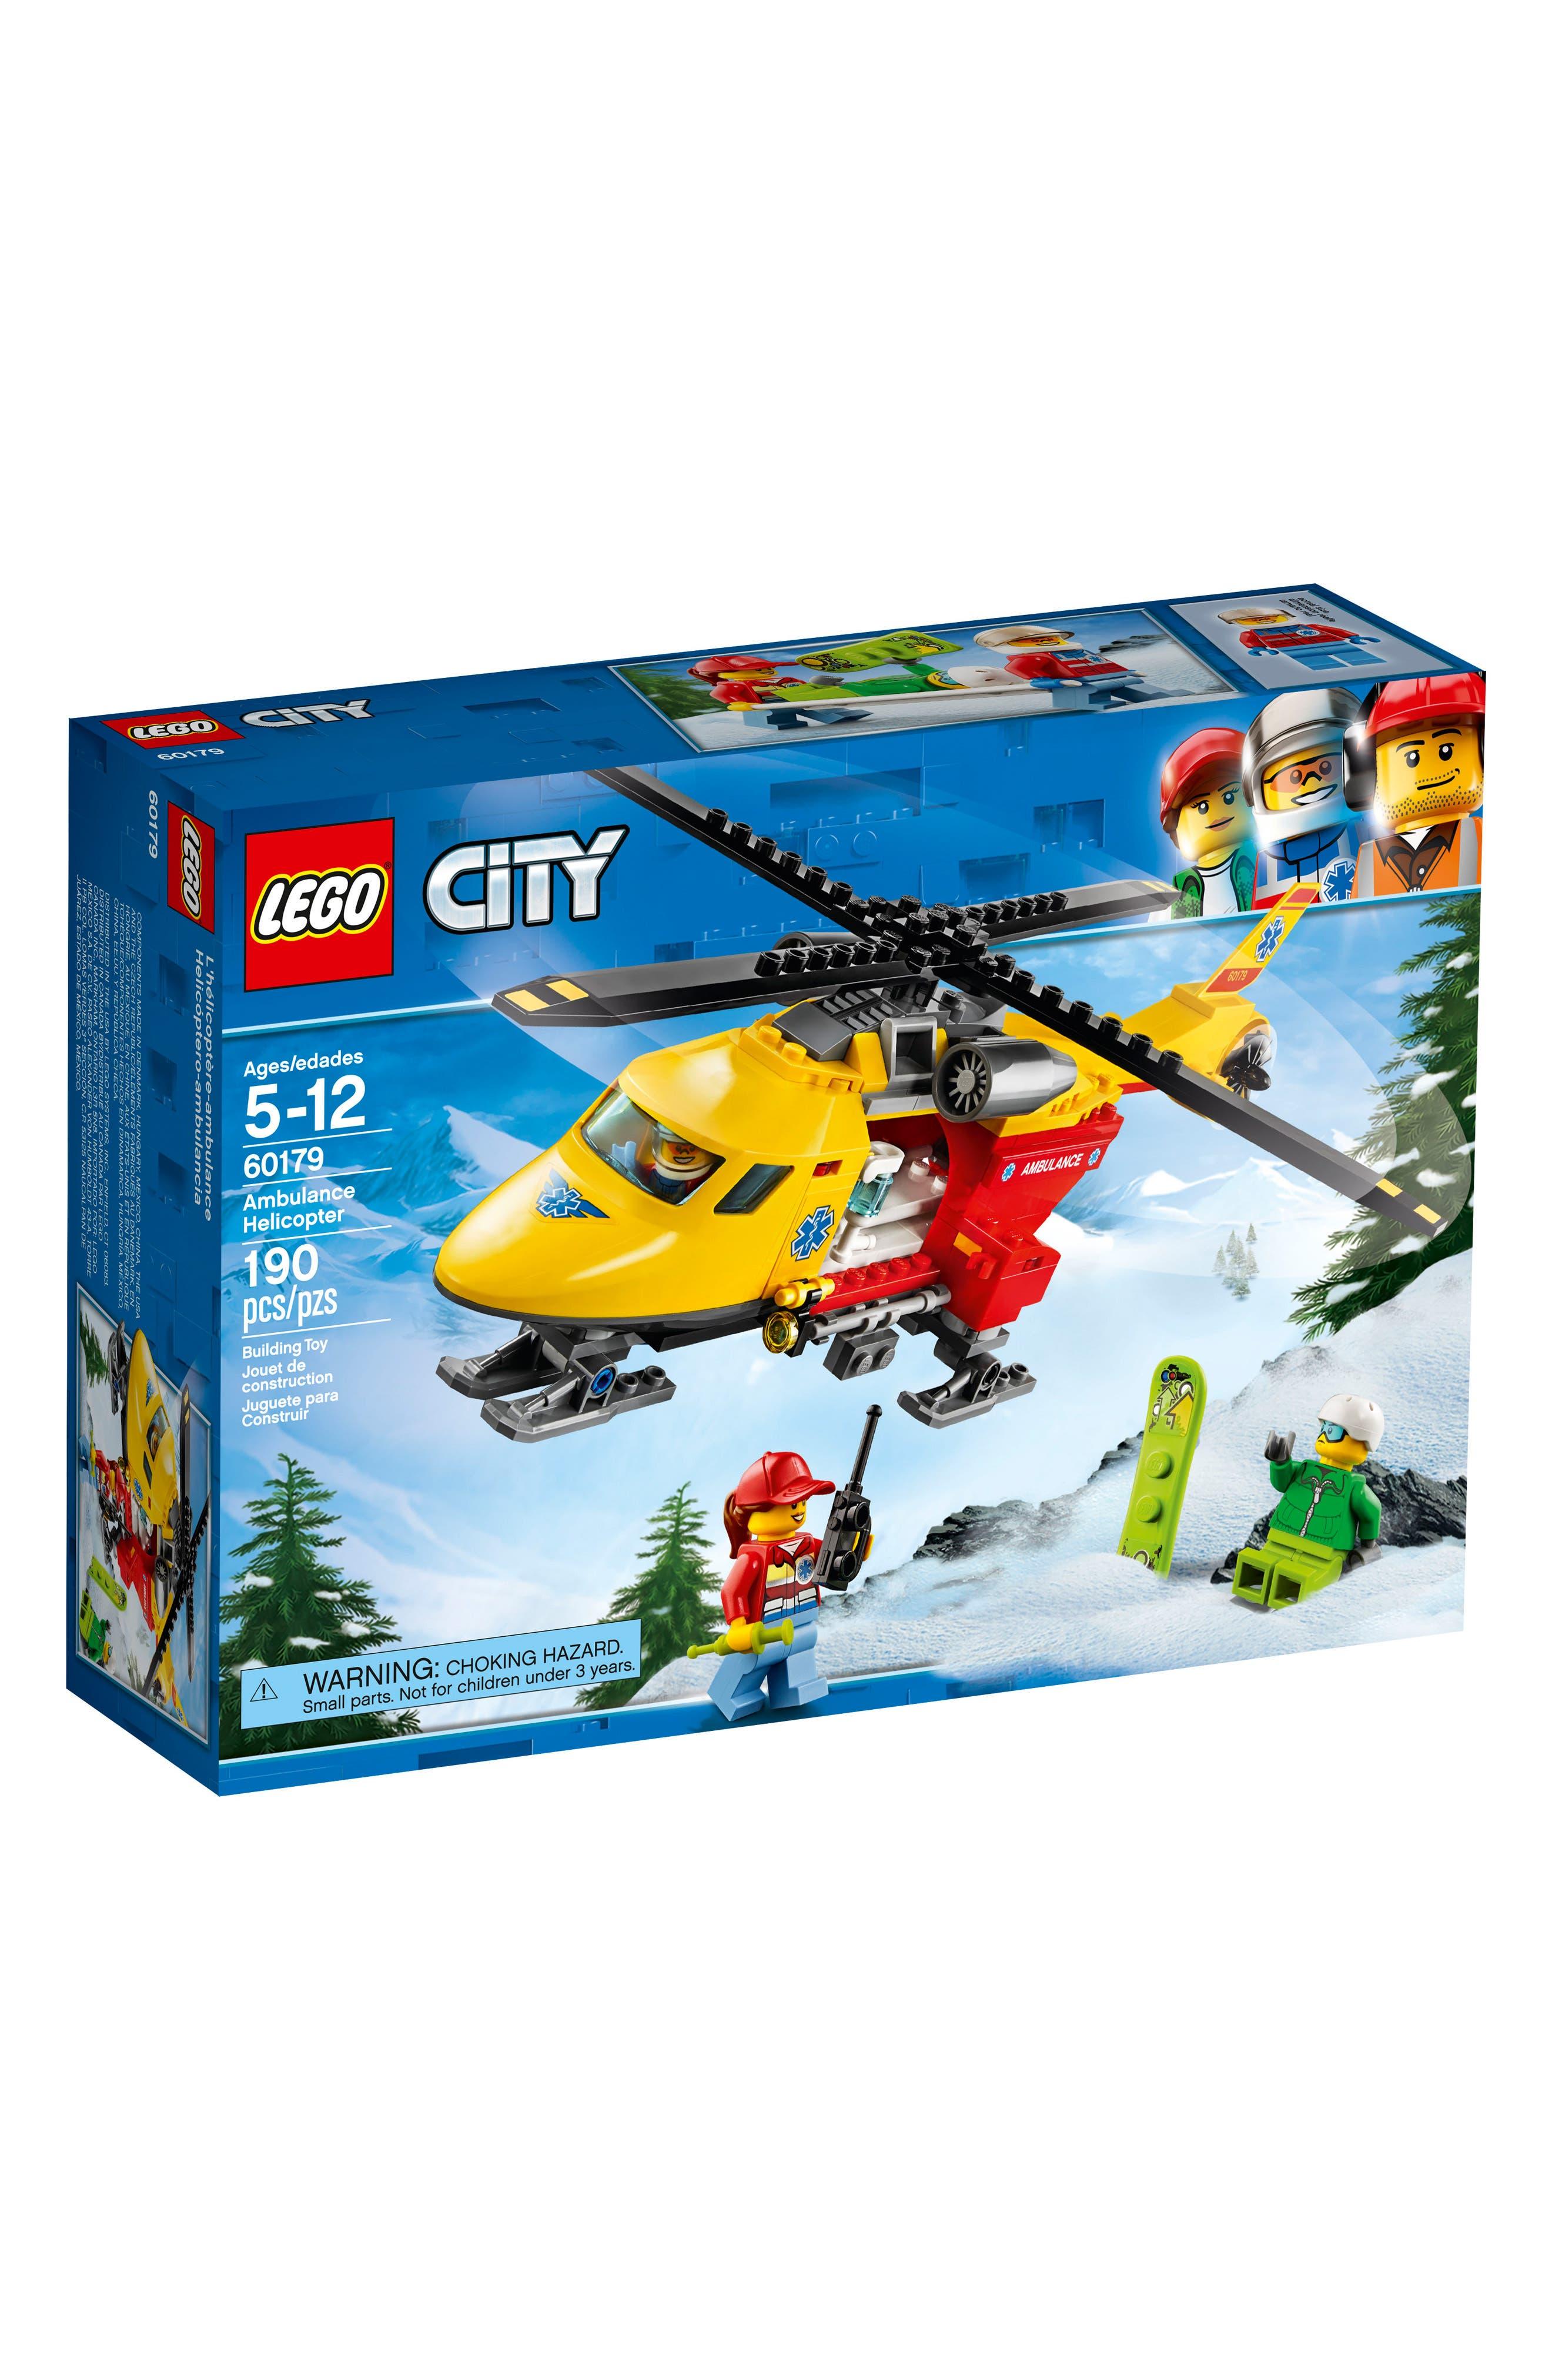 LEGO<sup>™</sup> City Ambulance Helicopter - 60179,                             Main thumbnail 1, color,                             700